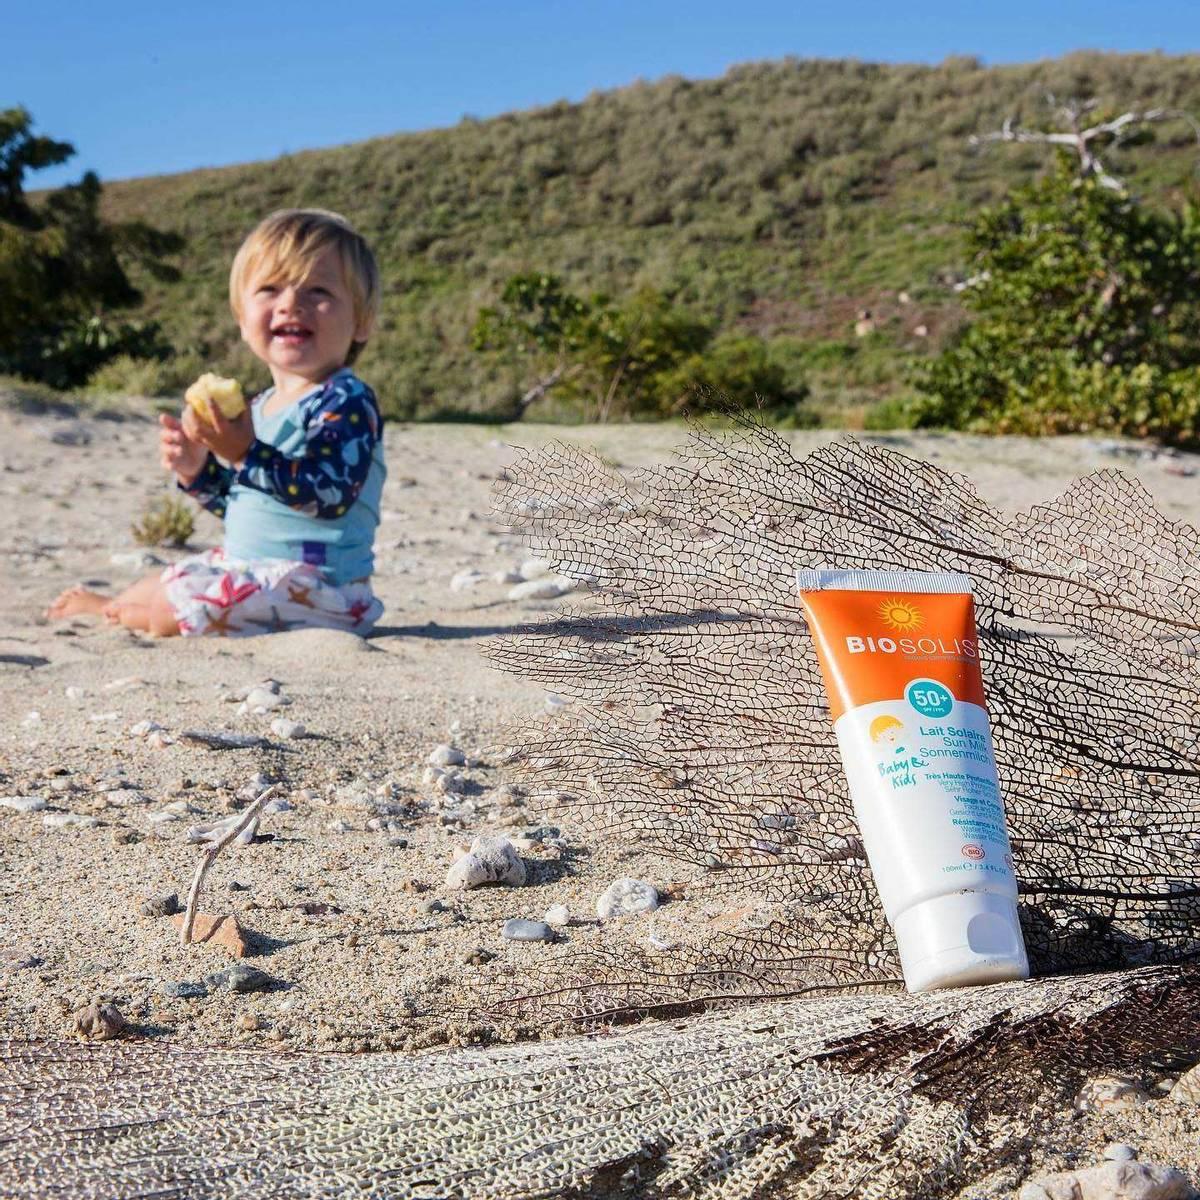 BIOSOLIS Sun Milk BABY & KIDS SPF 50+ 100 ml